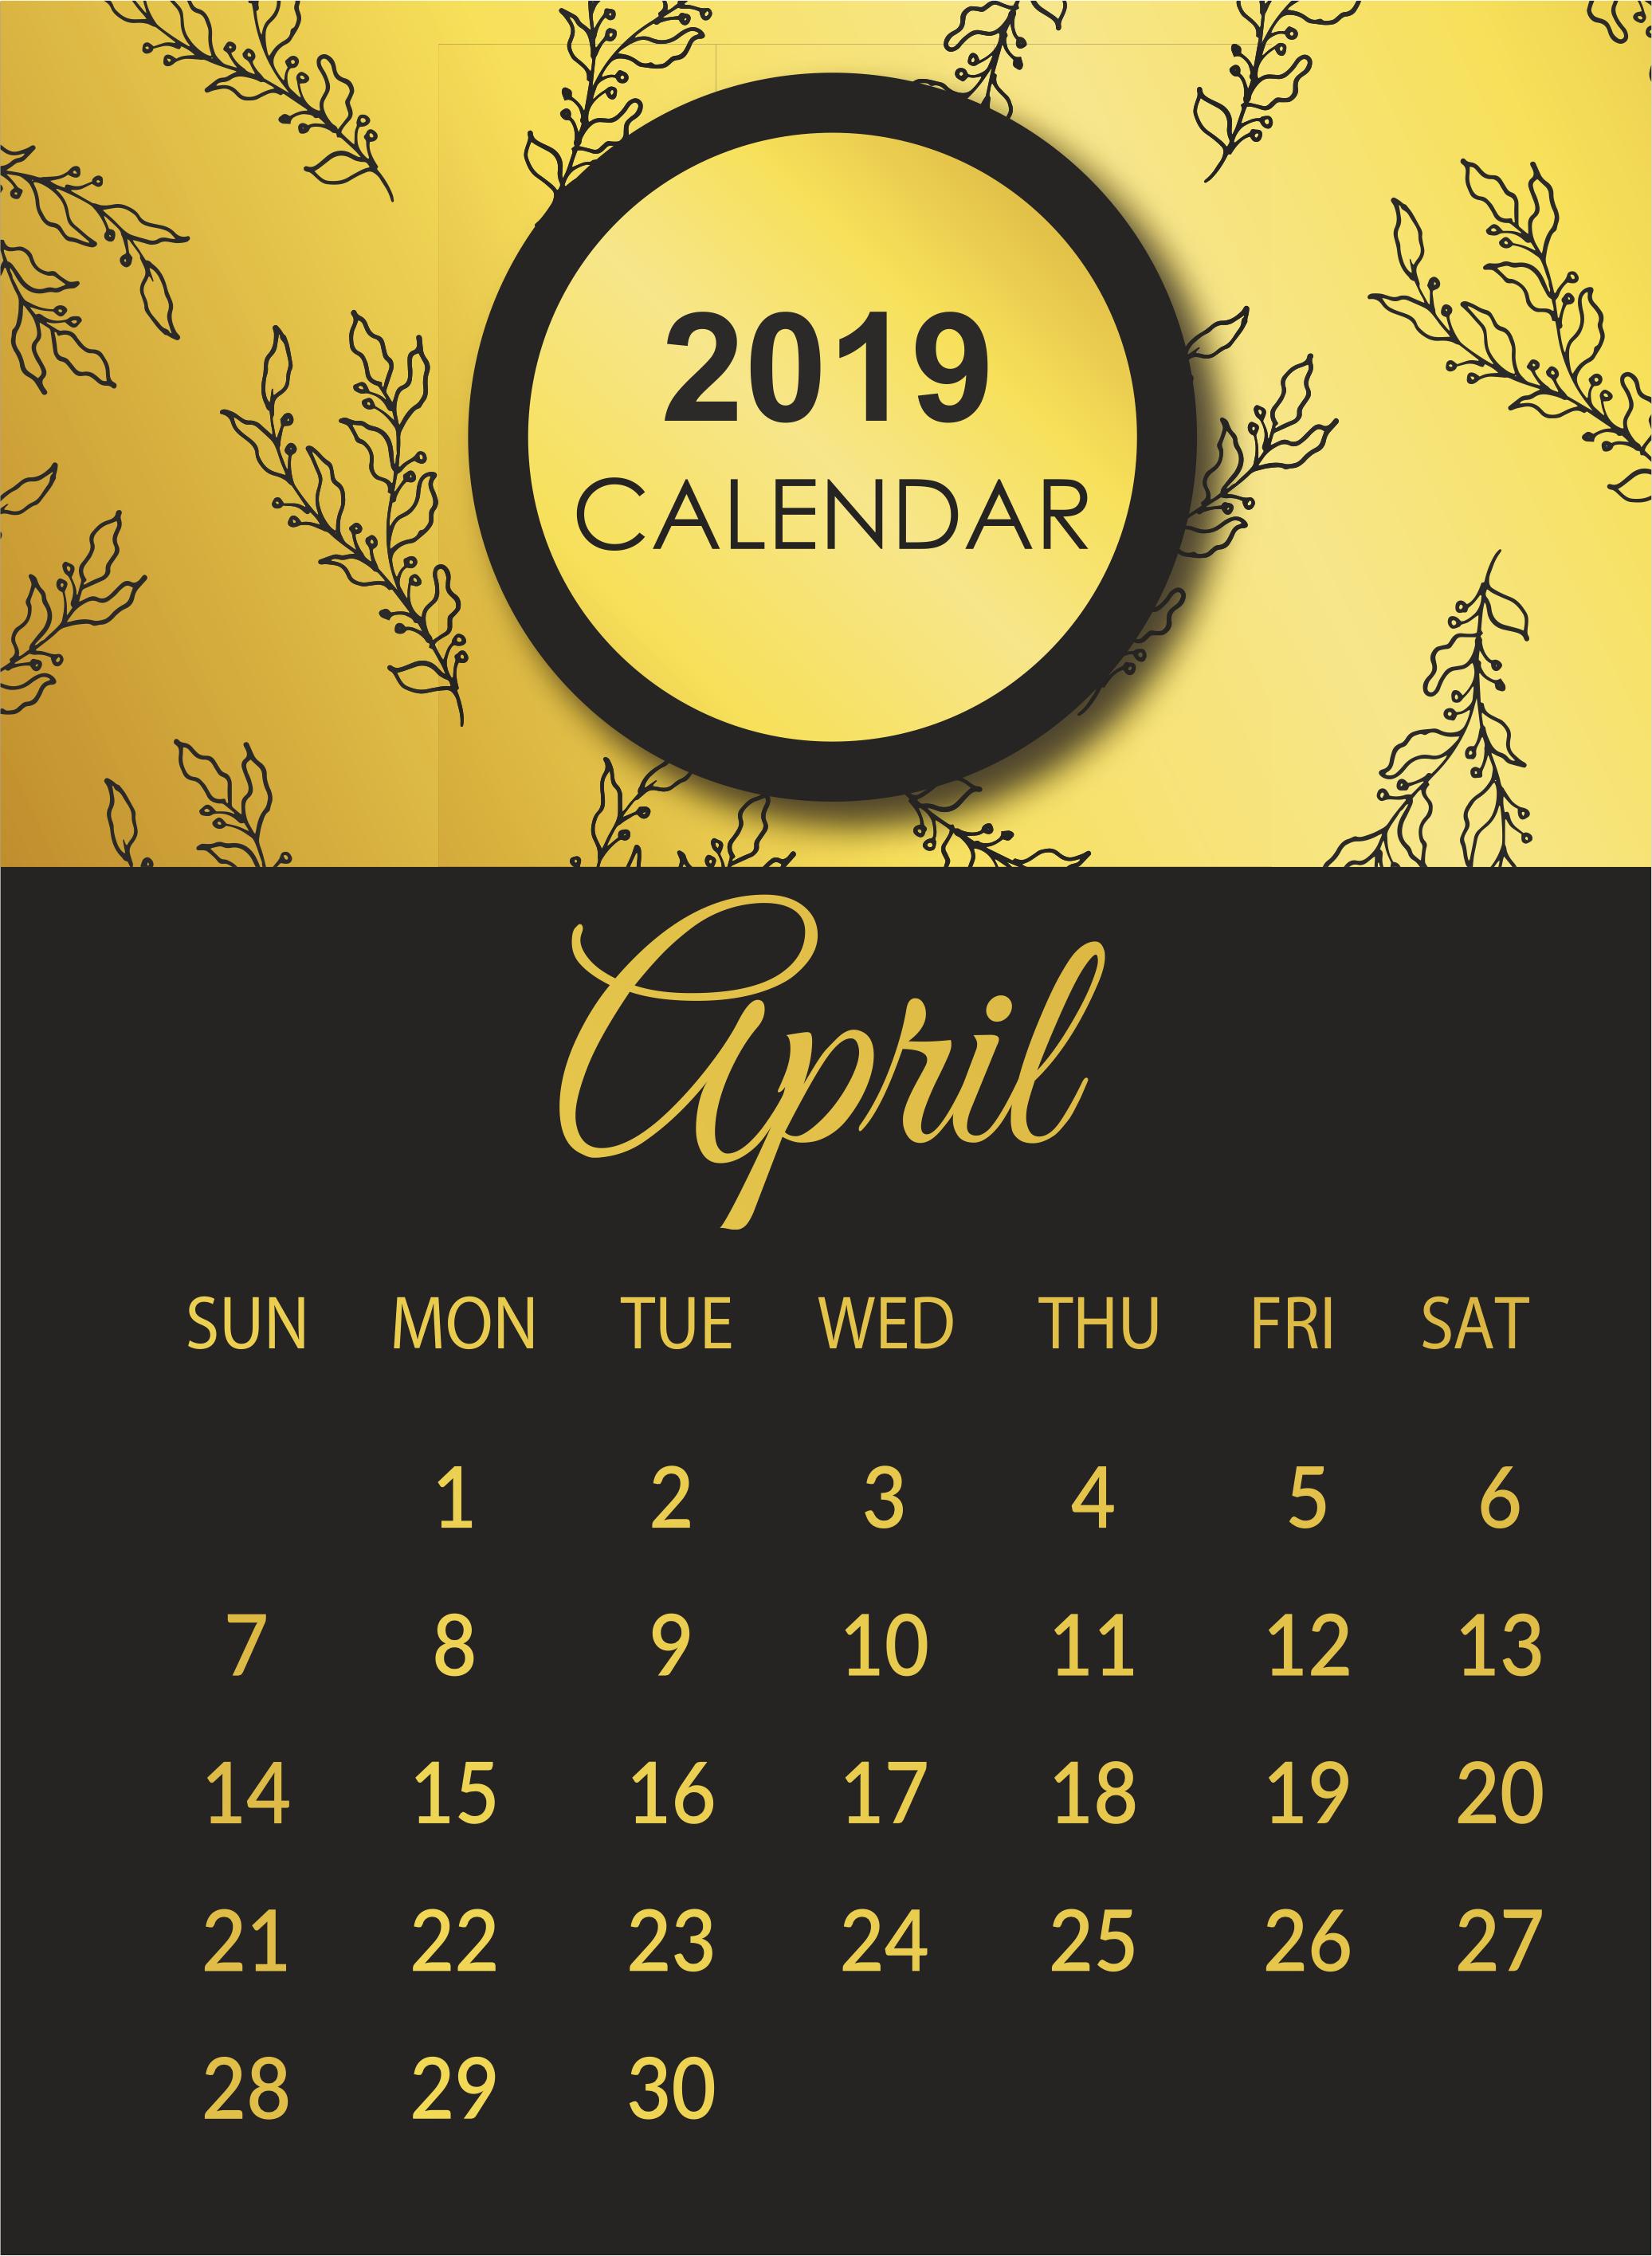 April 2019 Calendar Template Cute